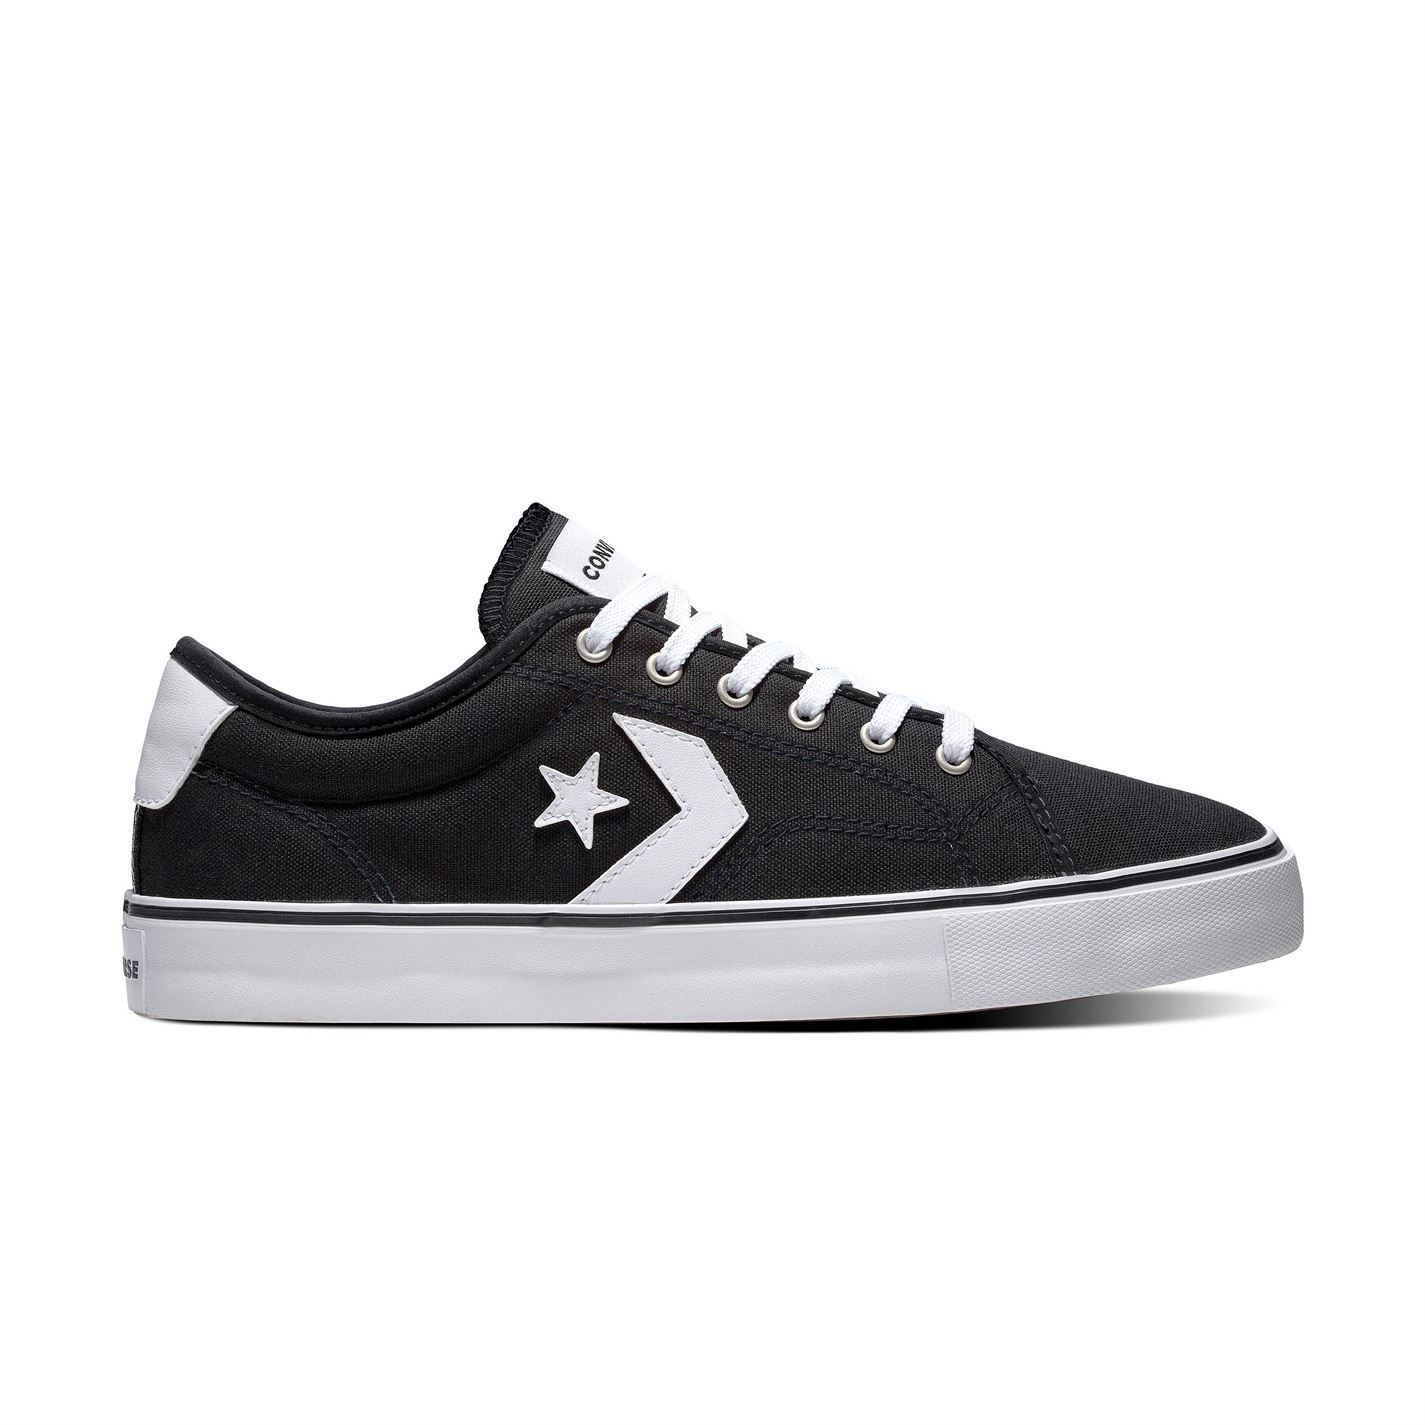 Converse-Ox-REPLAY-Baskets-Pour-Homme-Chaussures-De-Loisirs-Chaussures-Baskets miniature 7